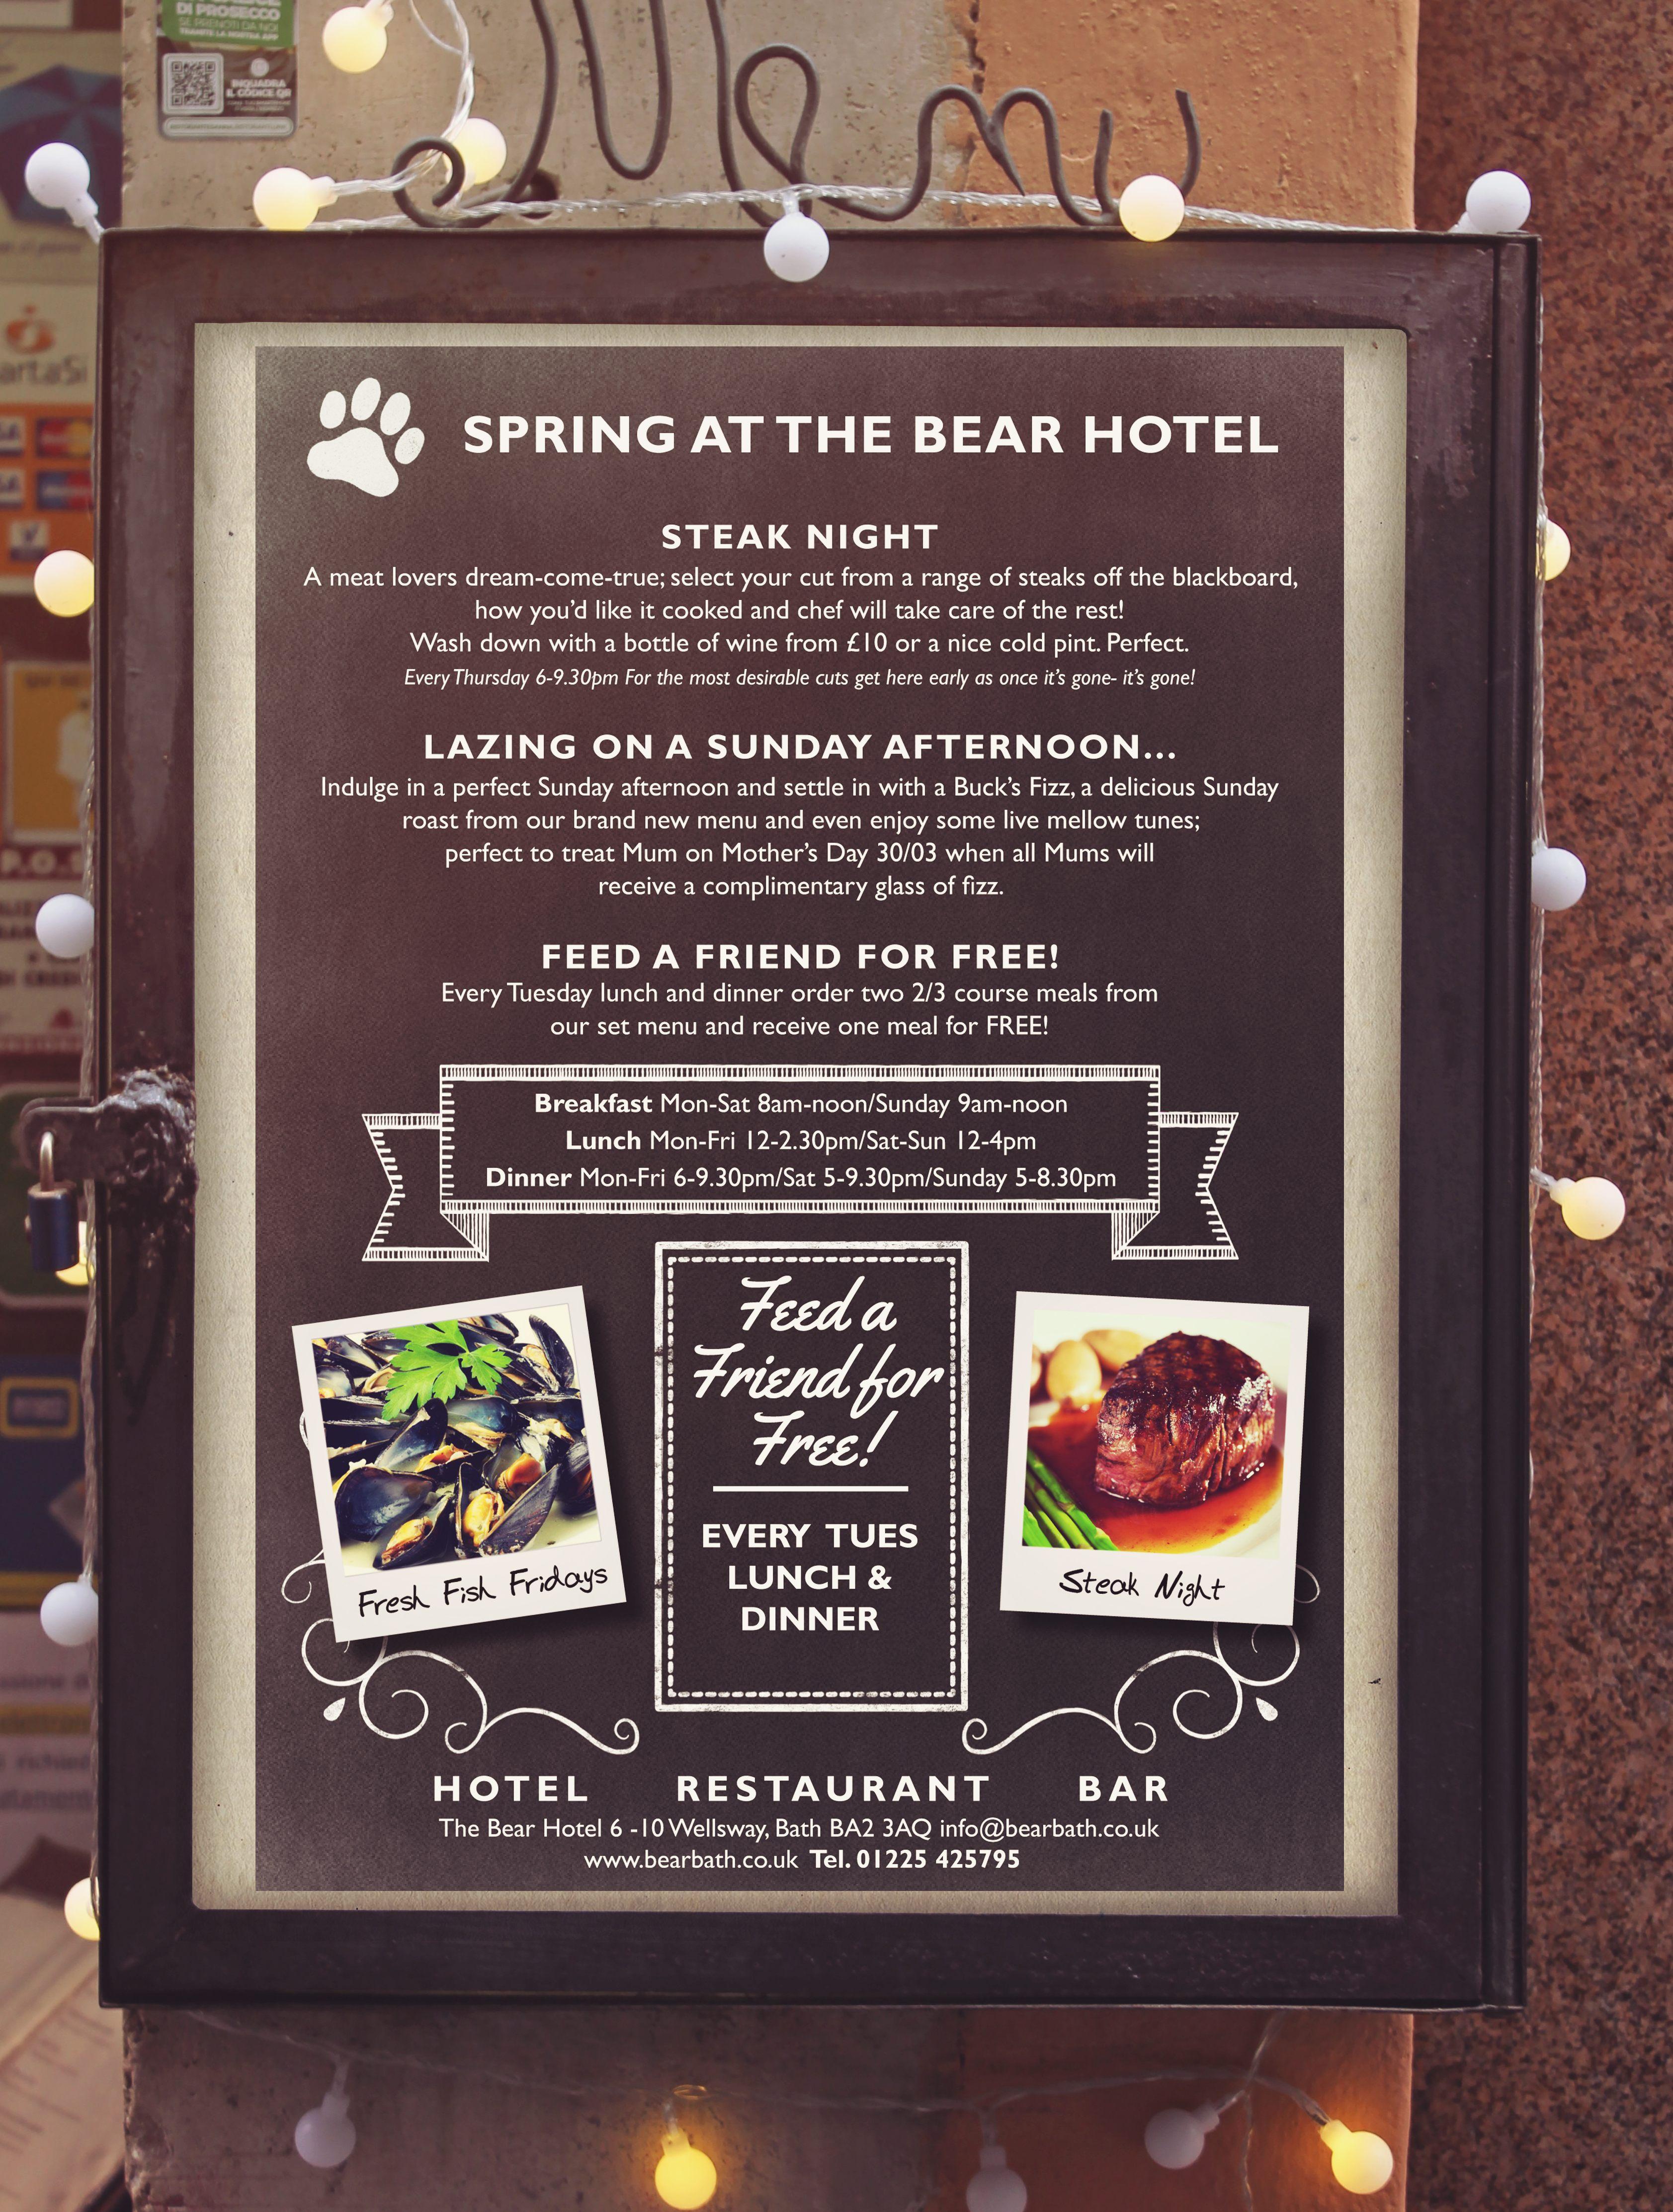 Restaurant menu in display case